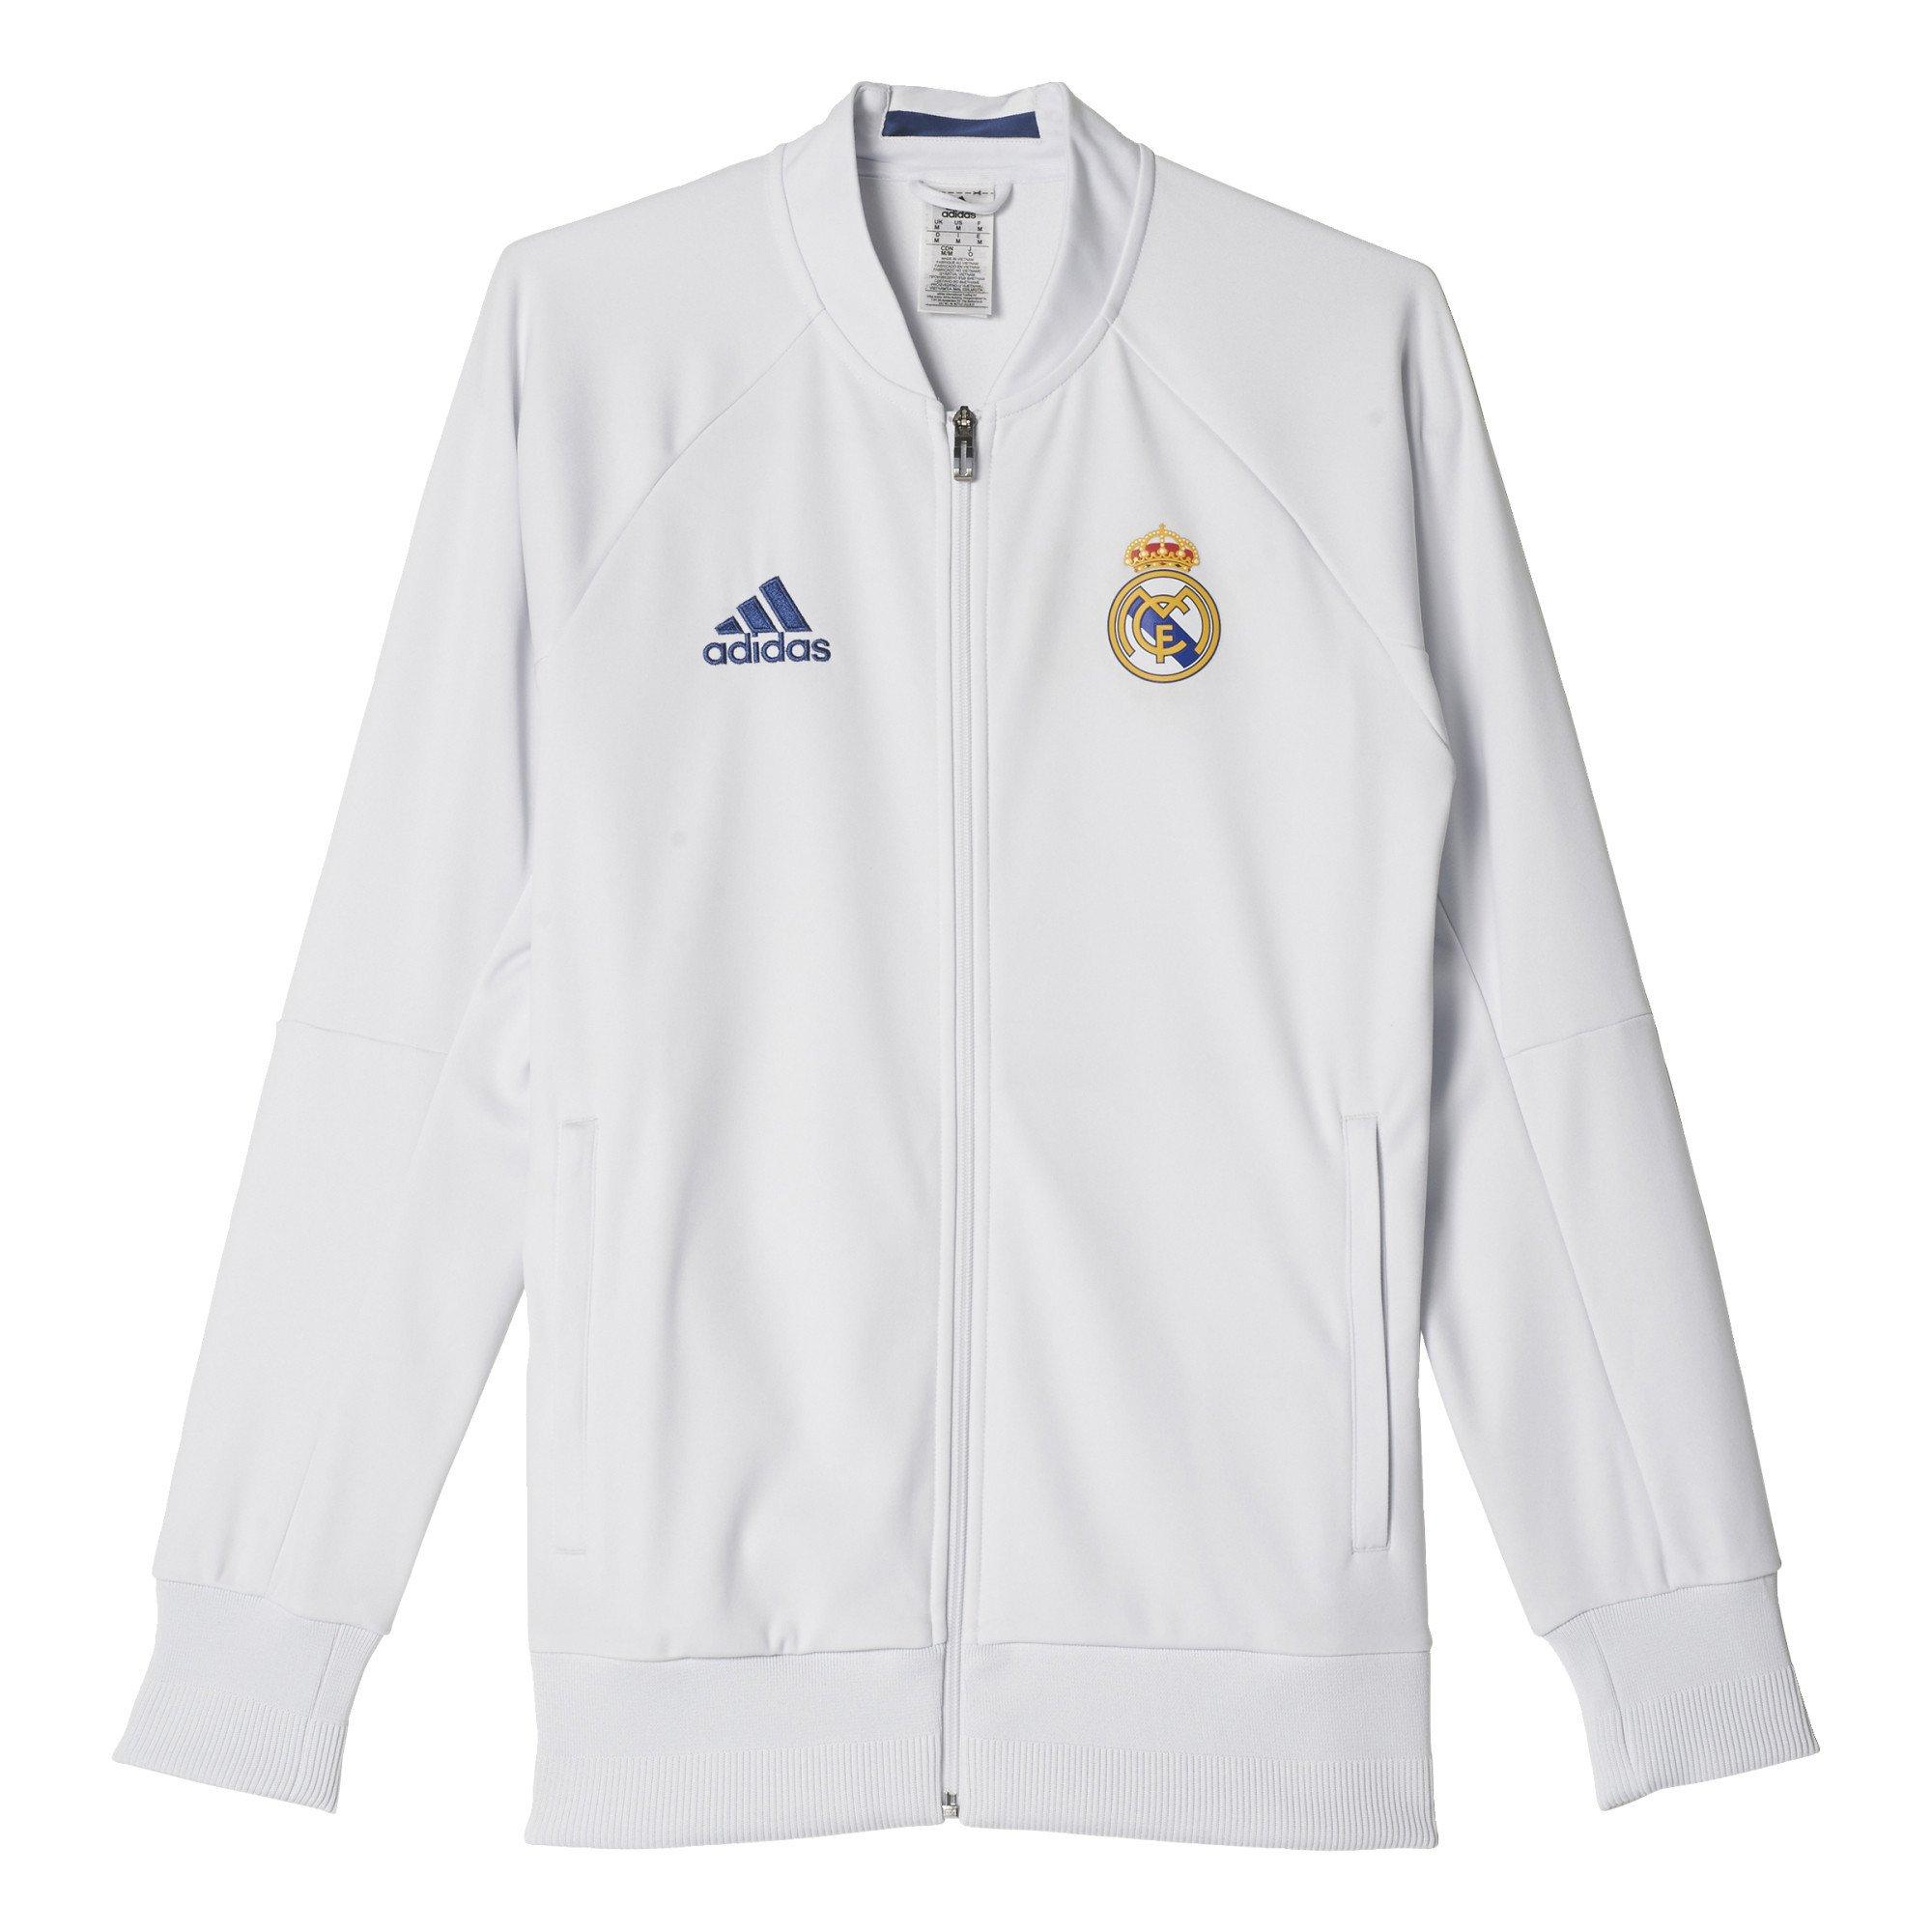 Adidas Men's Real Madrid Anthem Track Jacket